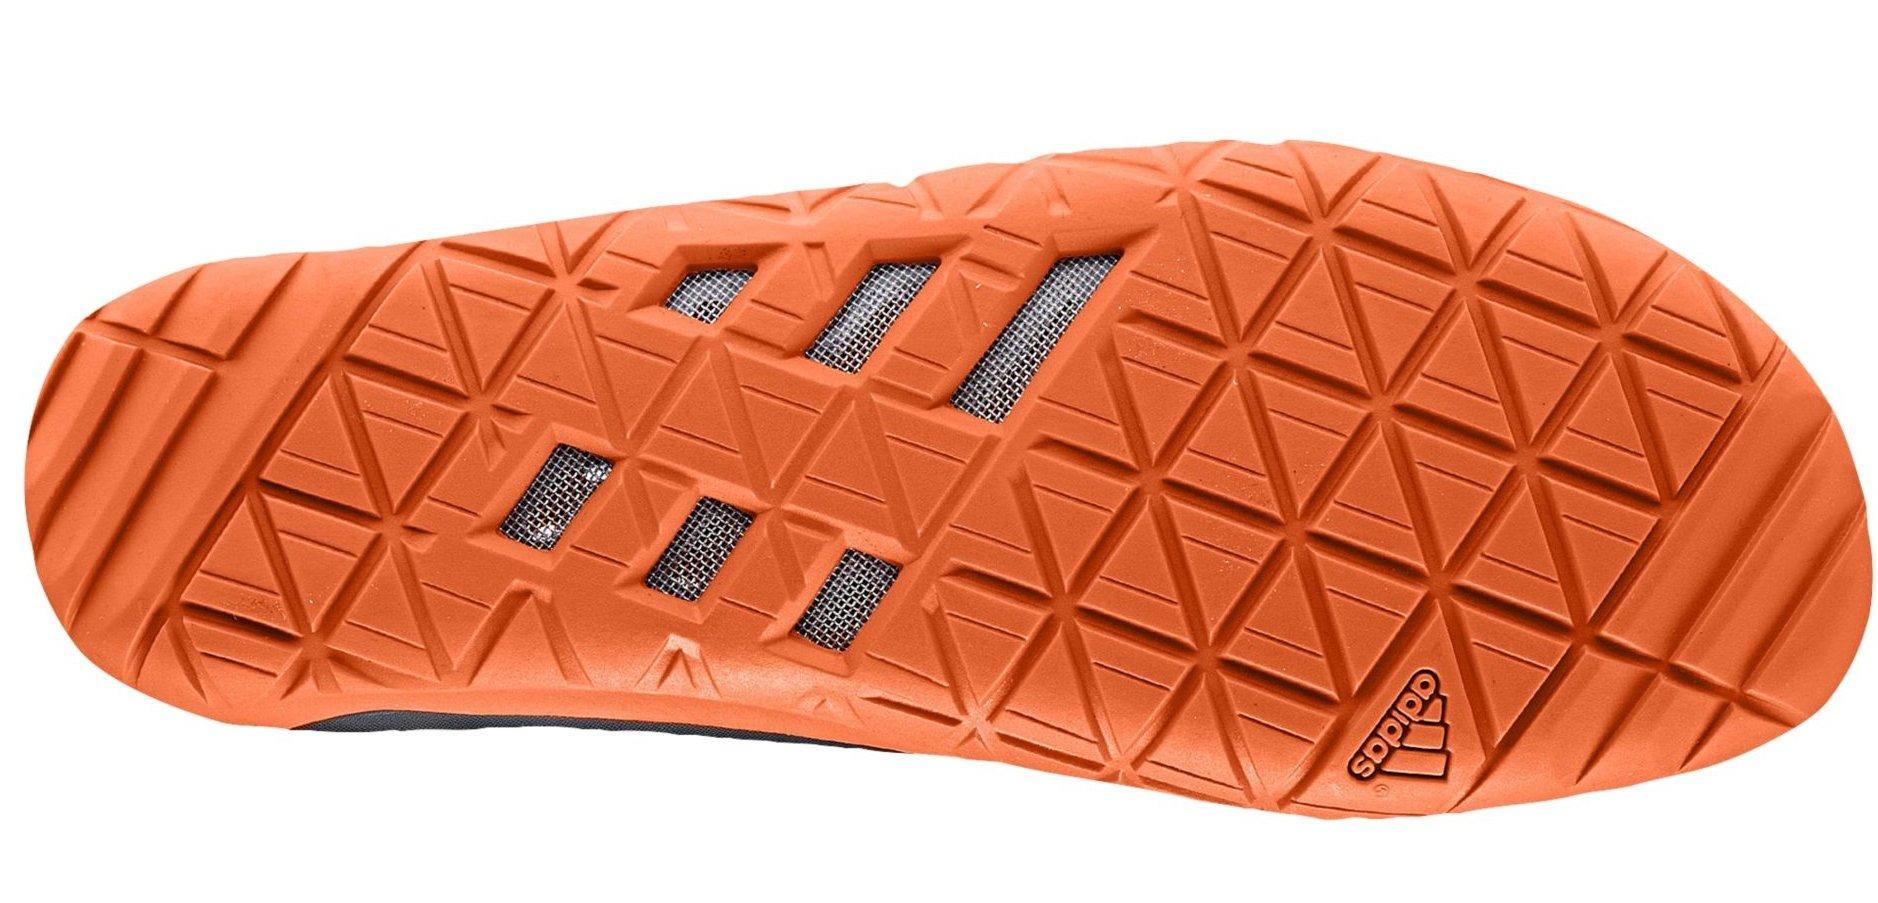 huge selection of 2c717 6b5f7 adidas Sport Performance Men